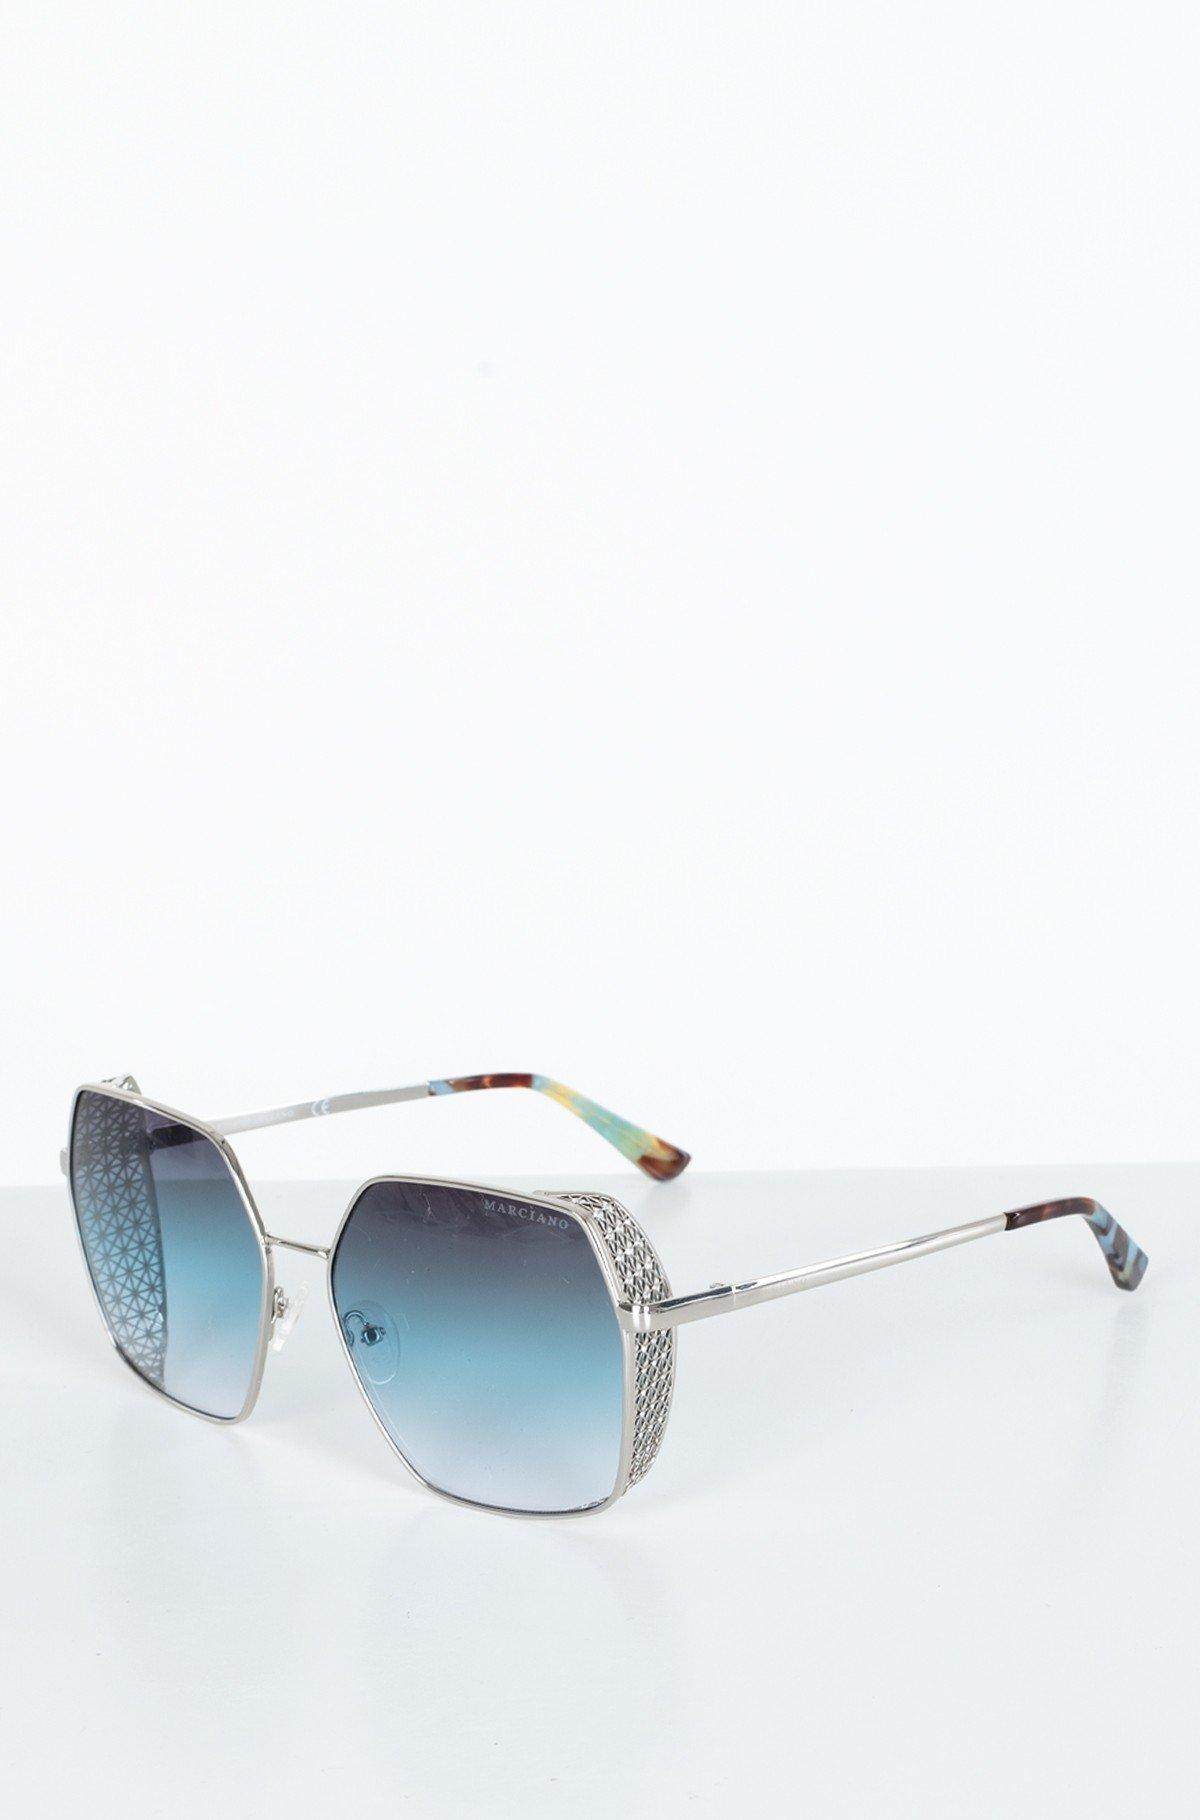 Sunglasses 0808-full-2